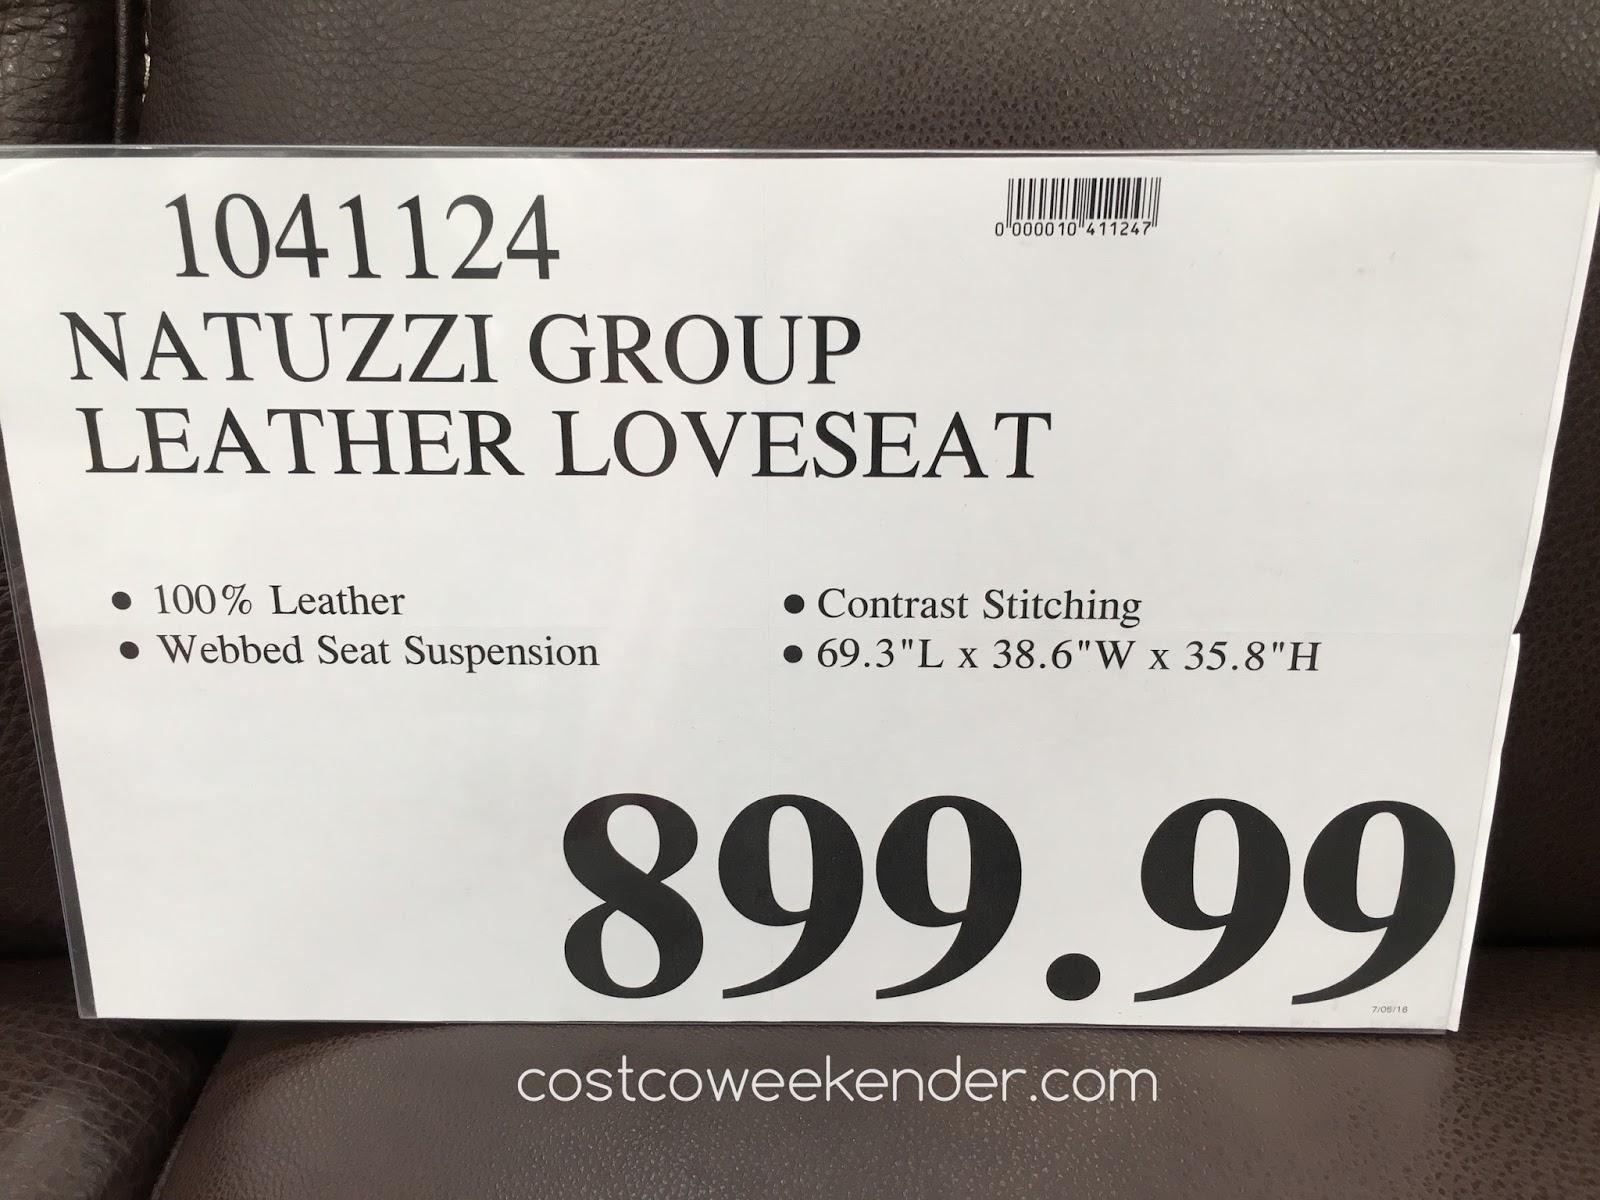 natuzzi group leather sofa costco cindy loveseat weekender